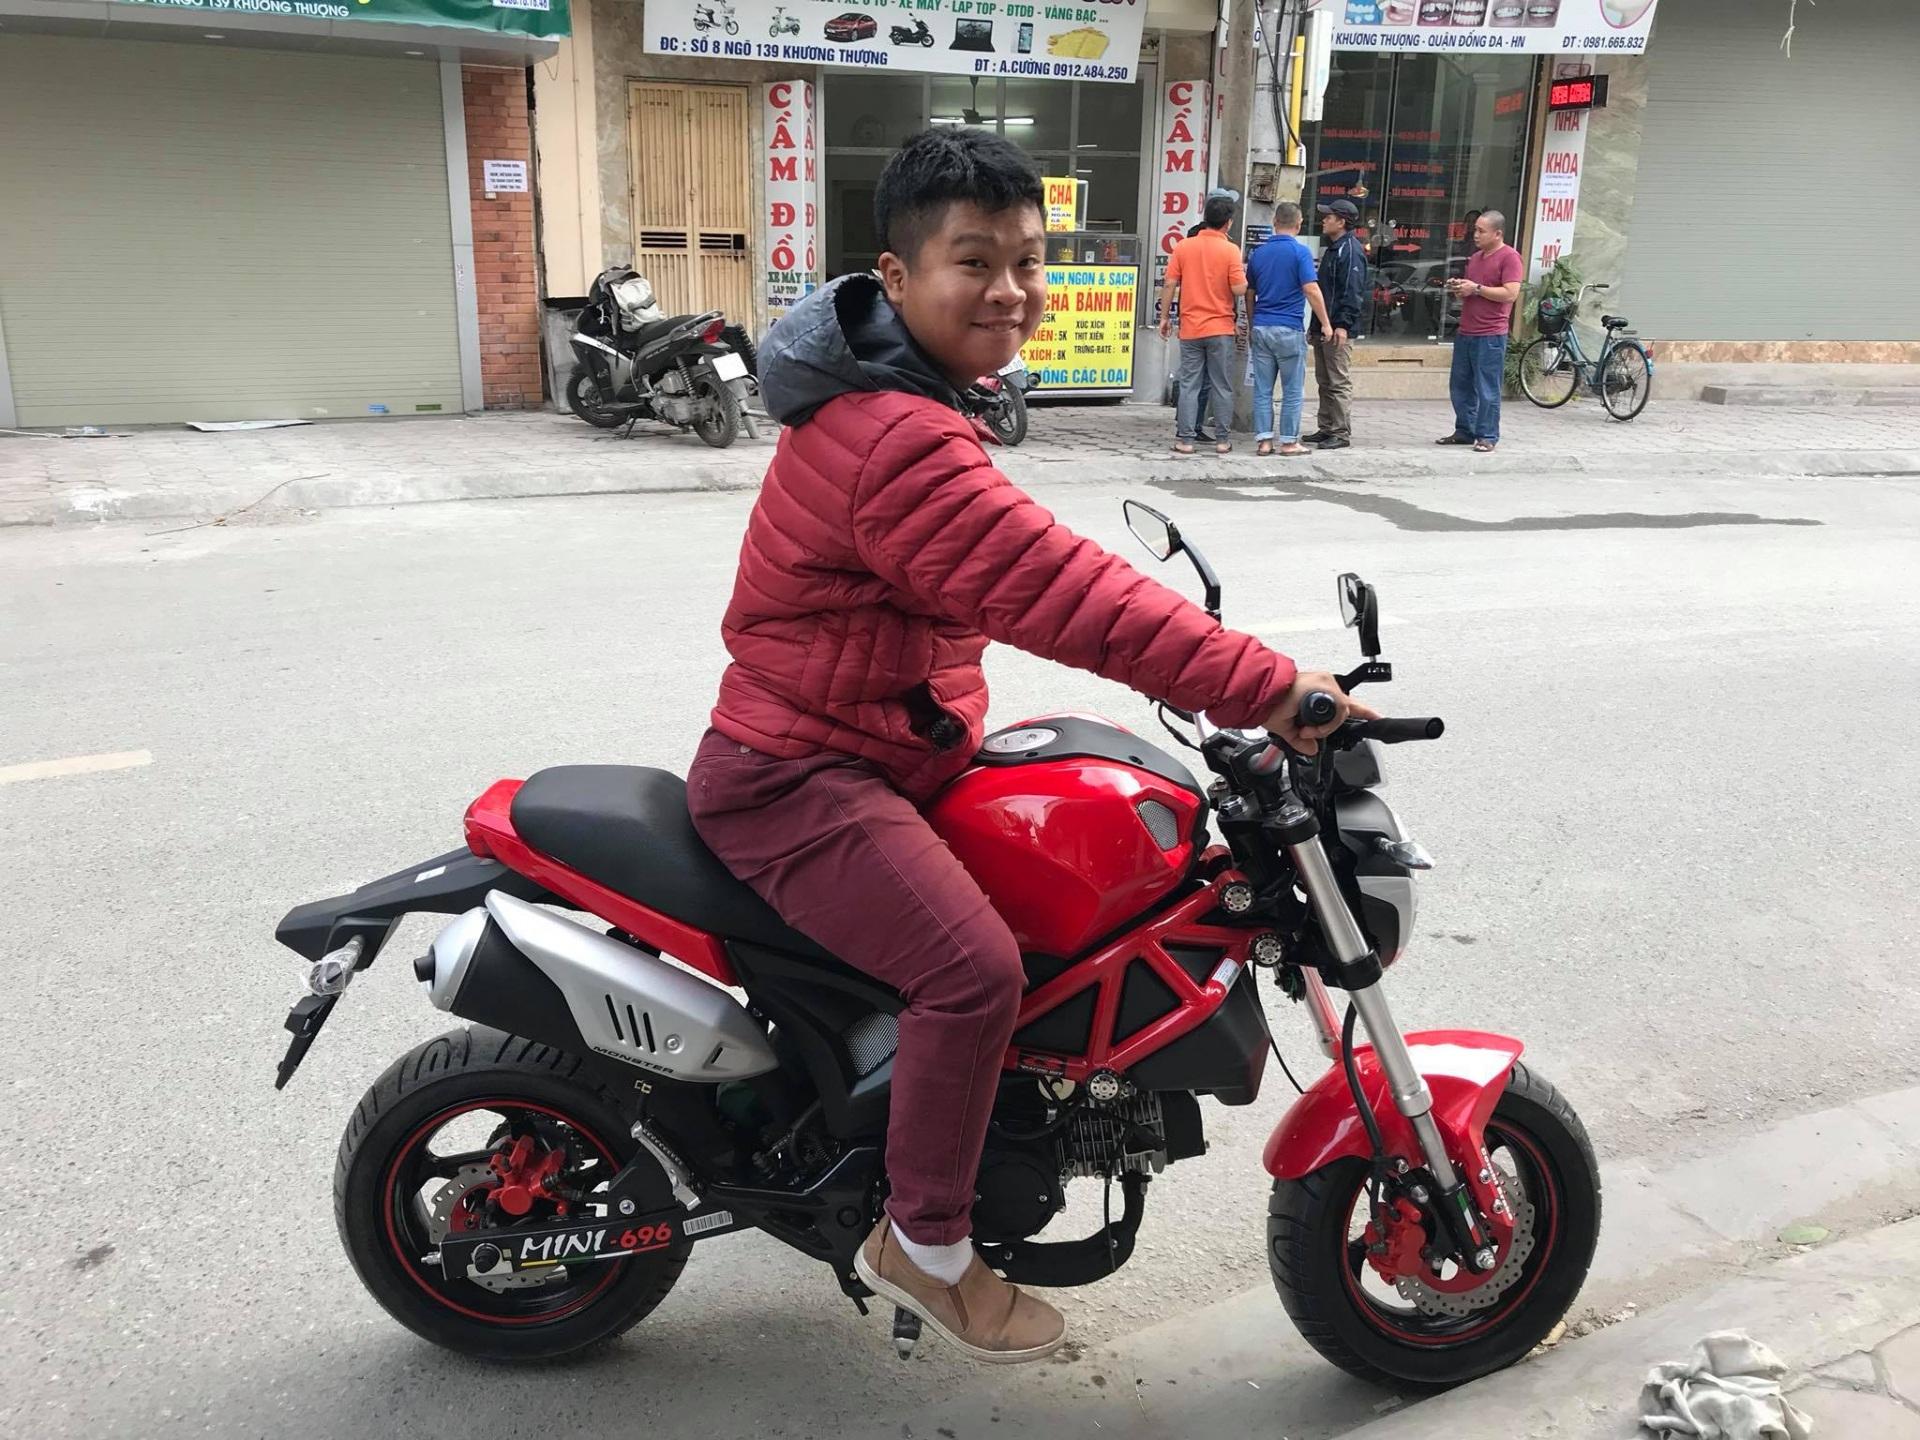 Zdjęcia Ducati Mini Indie Ducati Made In India Wlosi Beda Produkowac Malolitrazowe Motocykle